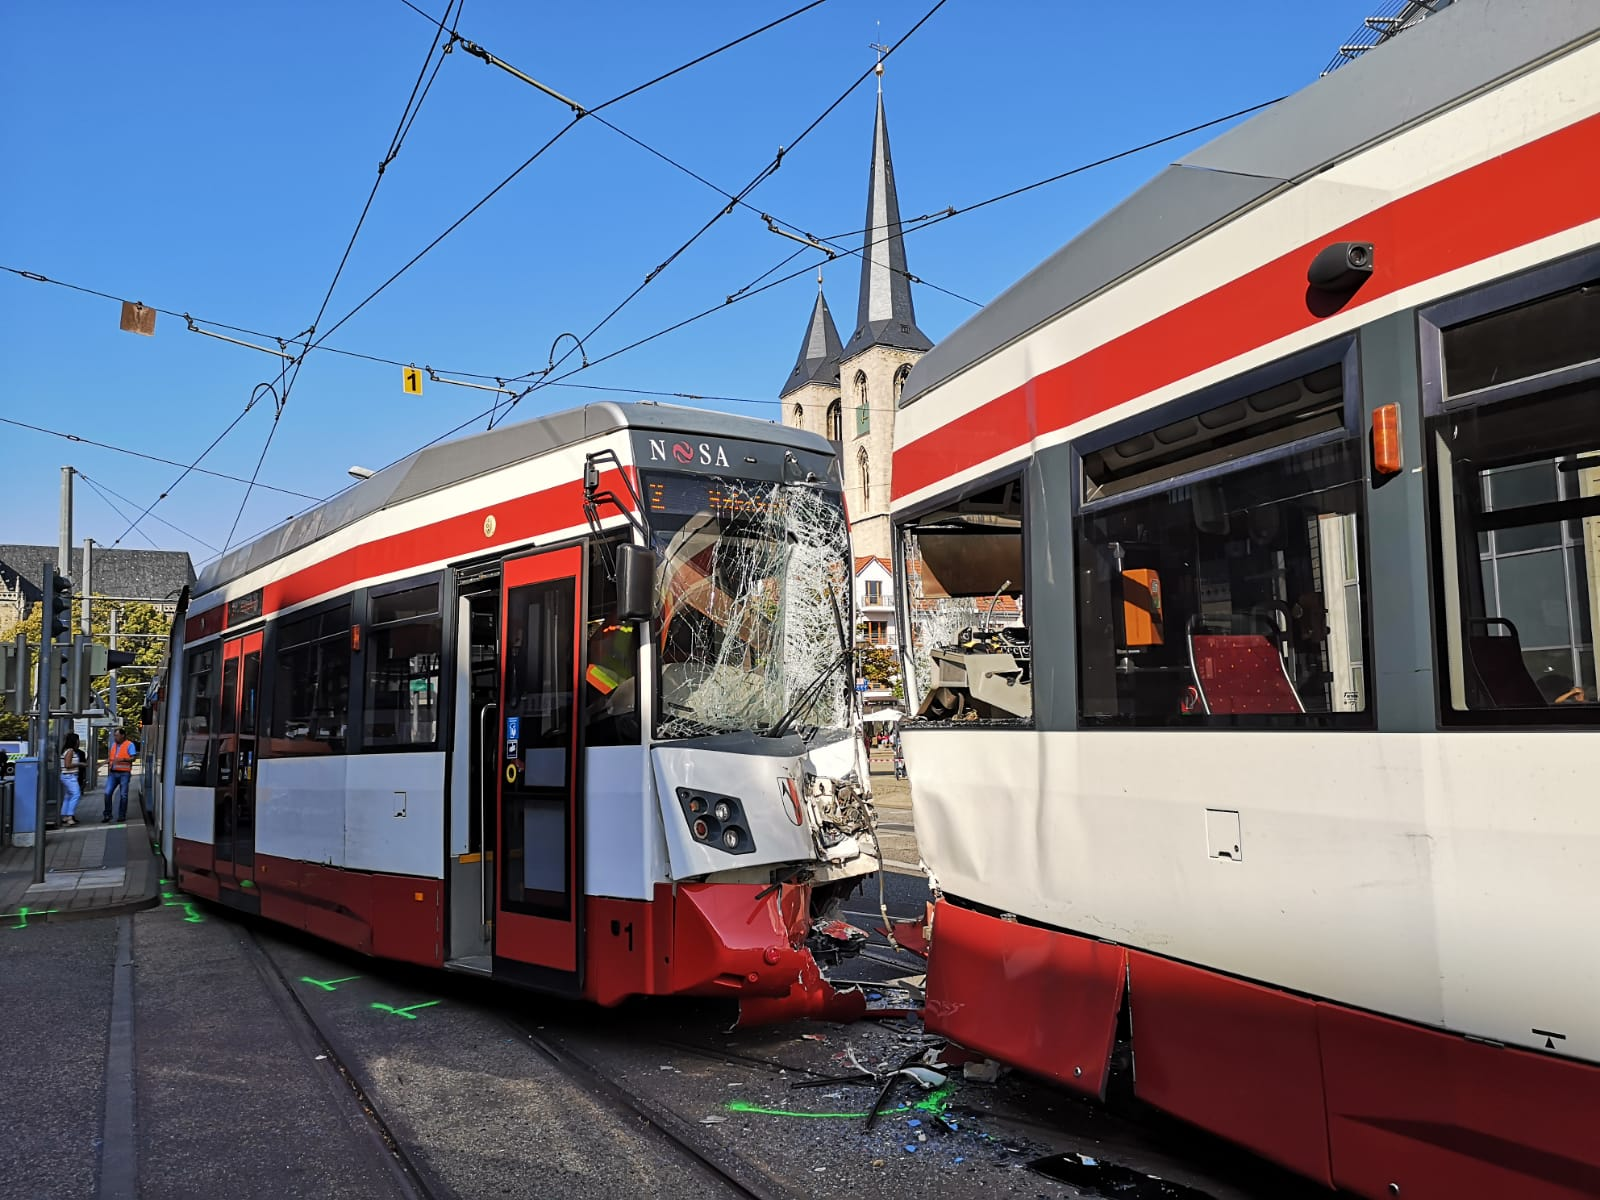 Straßenbahnunfall mit 11 Verletzten – Kühlinger Straße / Holzmarkt